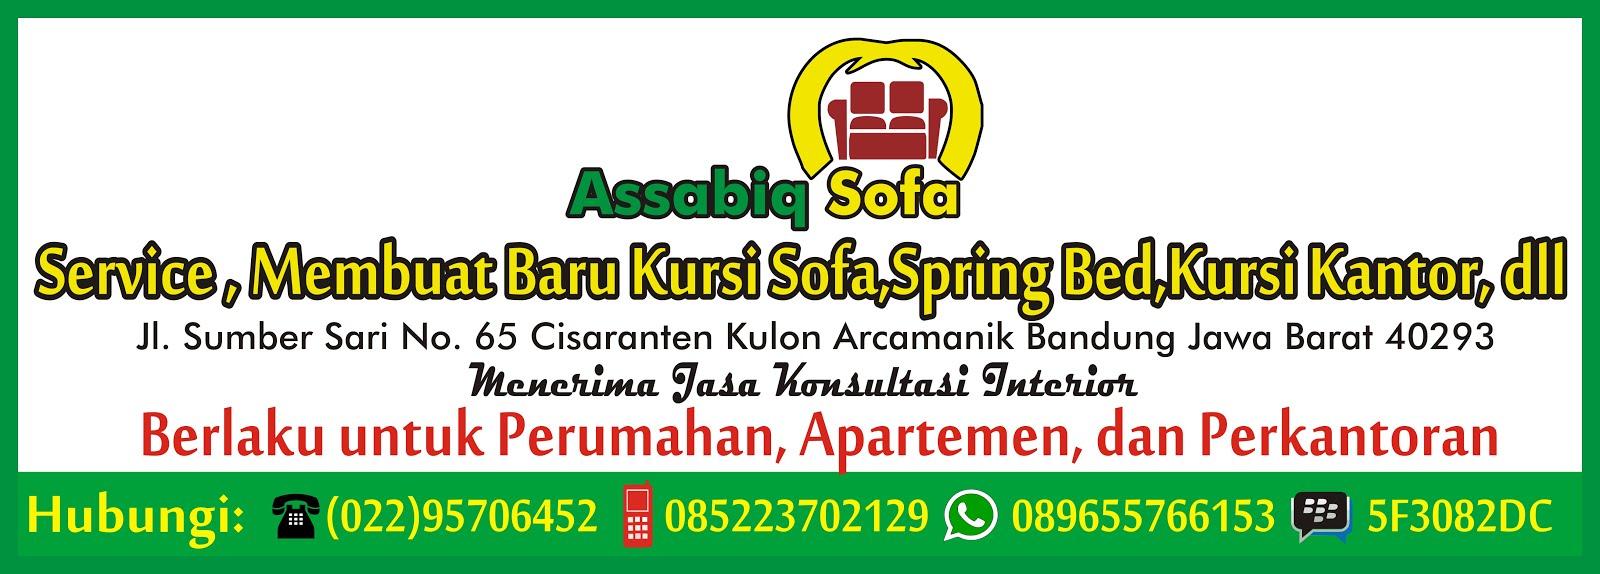 SERVICE KURSI/SOFA DI BANDUNG,PERBAIKAN SOFA, REPARASI SOFA, BIKIN BARU SOFA DI BANDUNG